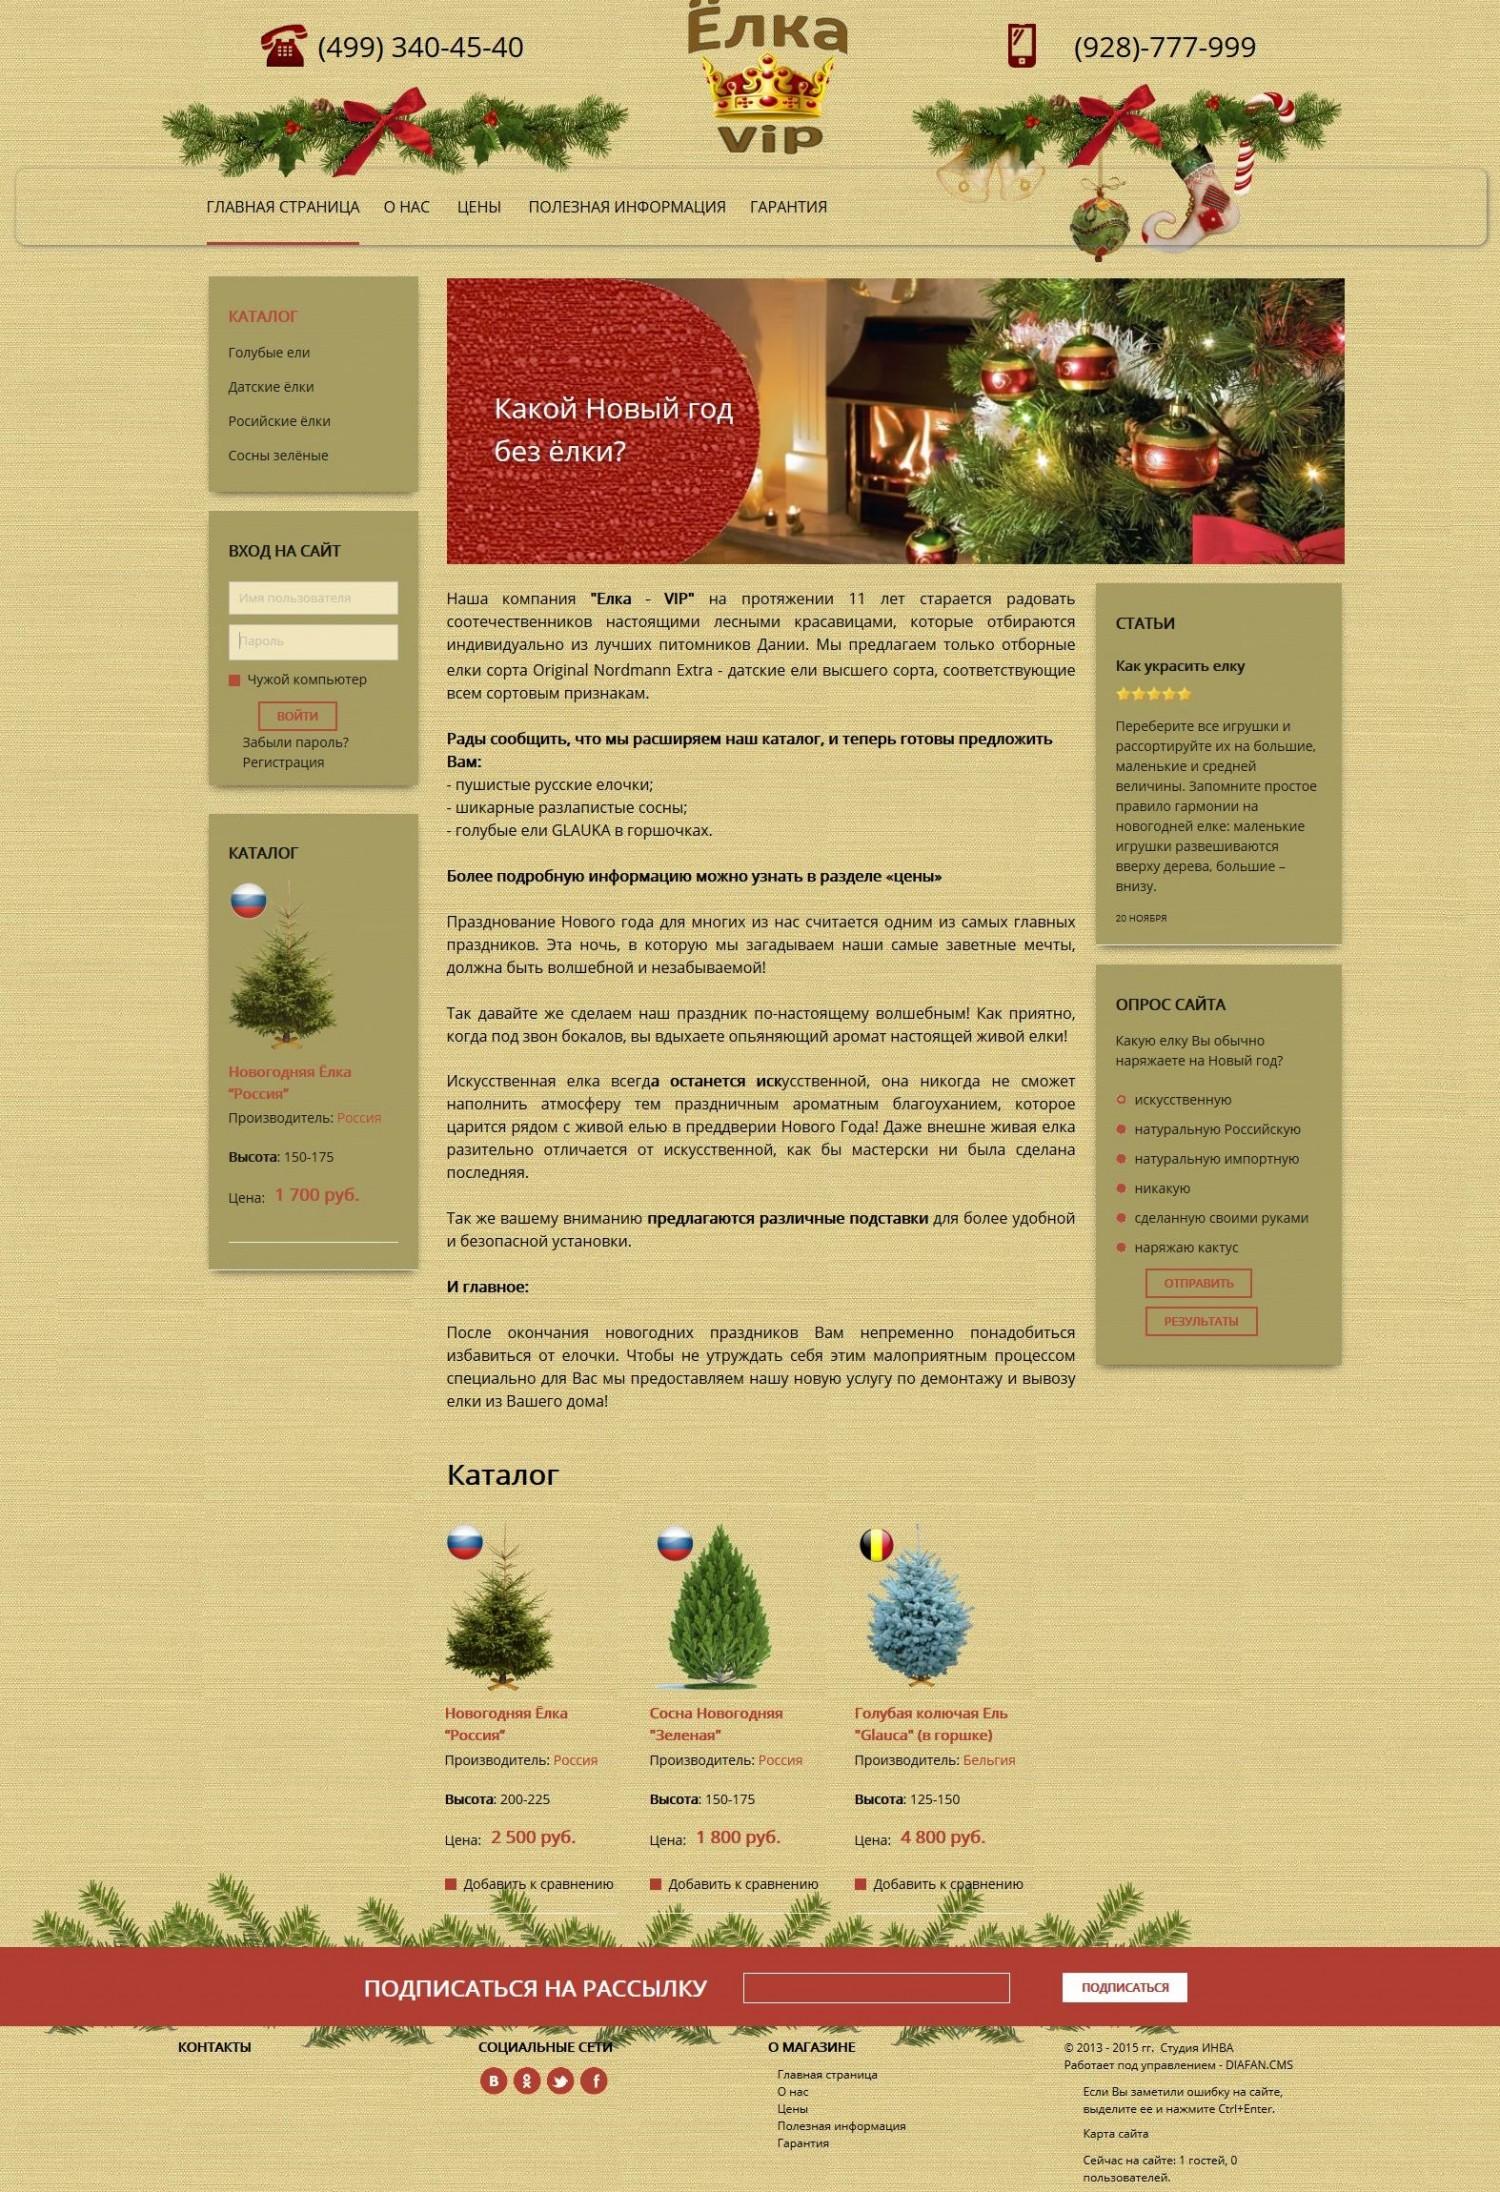 Сайт компании Elka-VIP